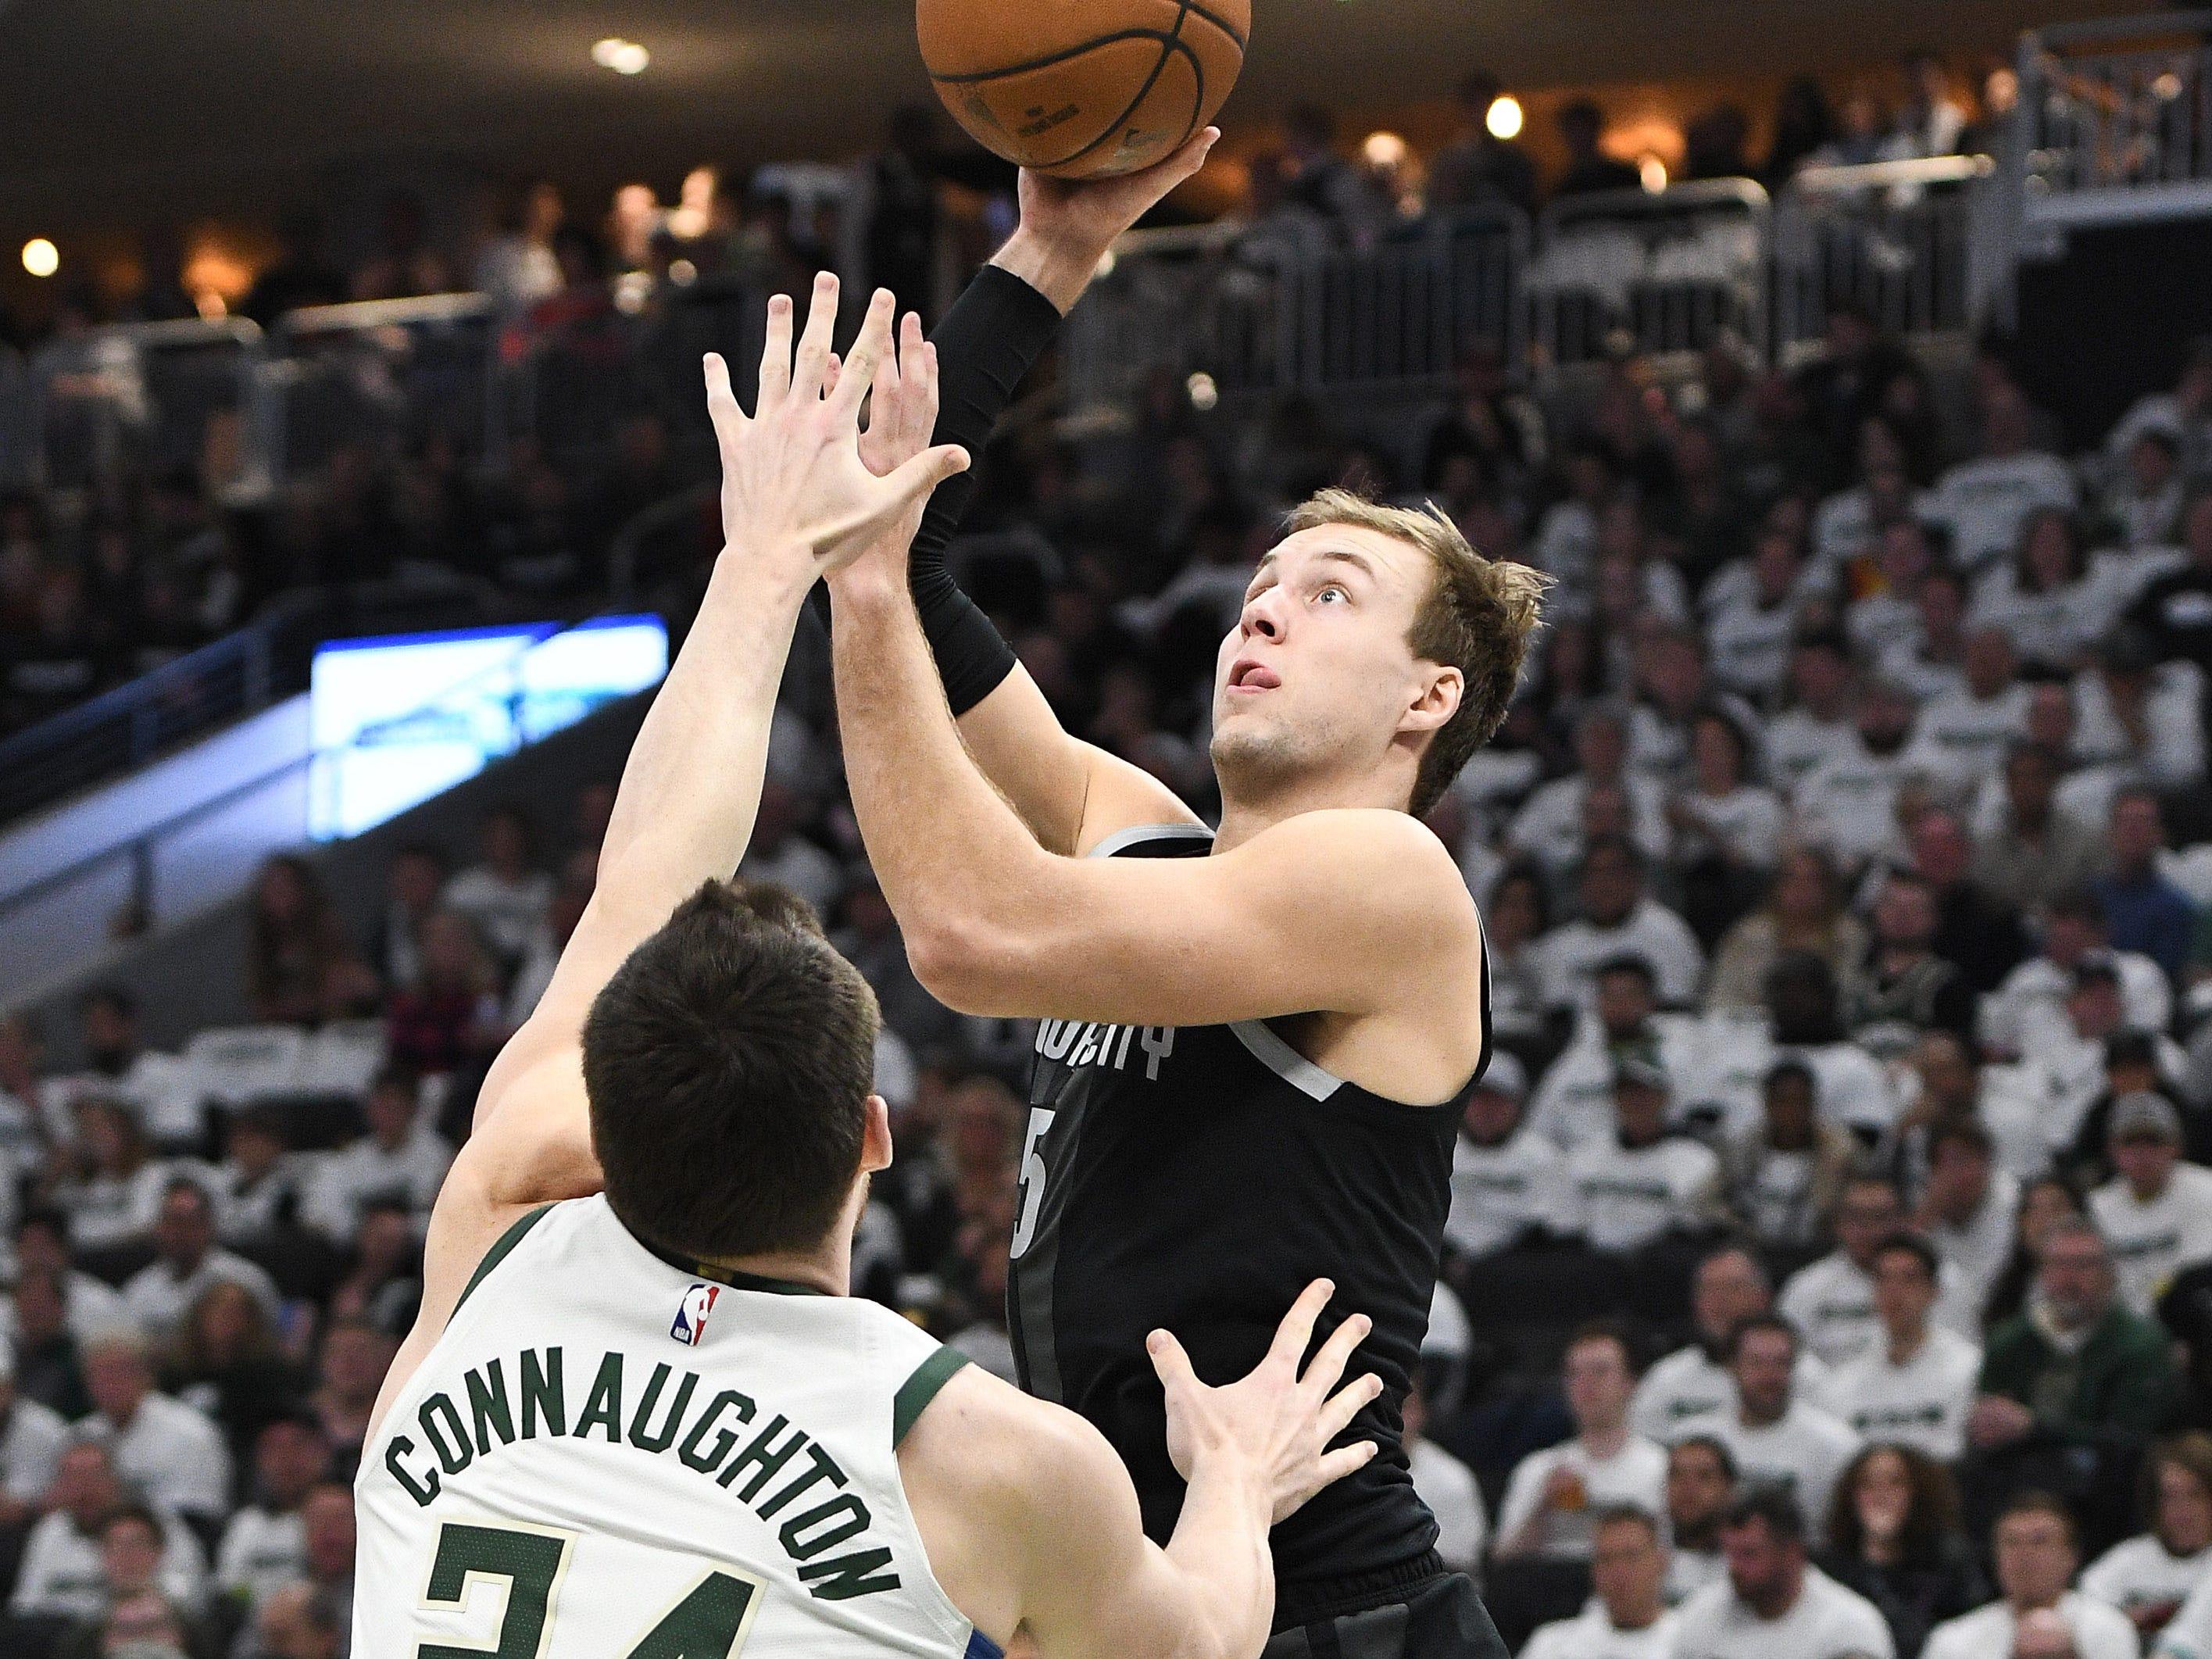 Detroit Pistons guard Luke Kennard shoots against Milwaukee Bucks forward Pat Connaughton during the third quarter of Game 1 at Fiserv Forum, April 14, 2019. The Bucks won, 121-86.